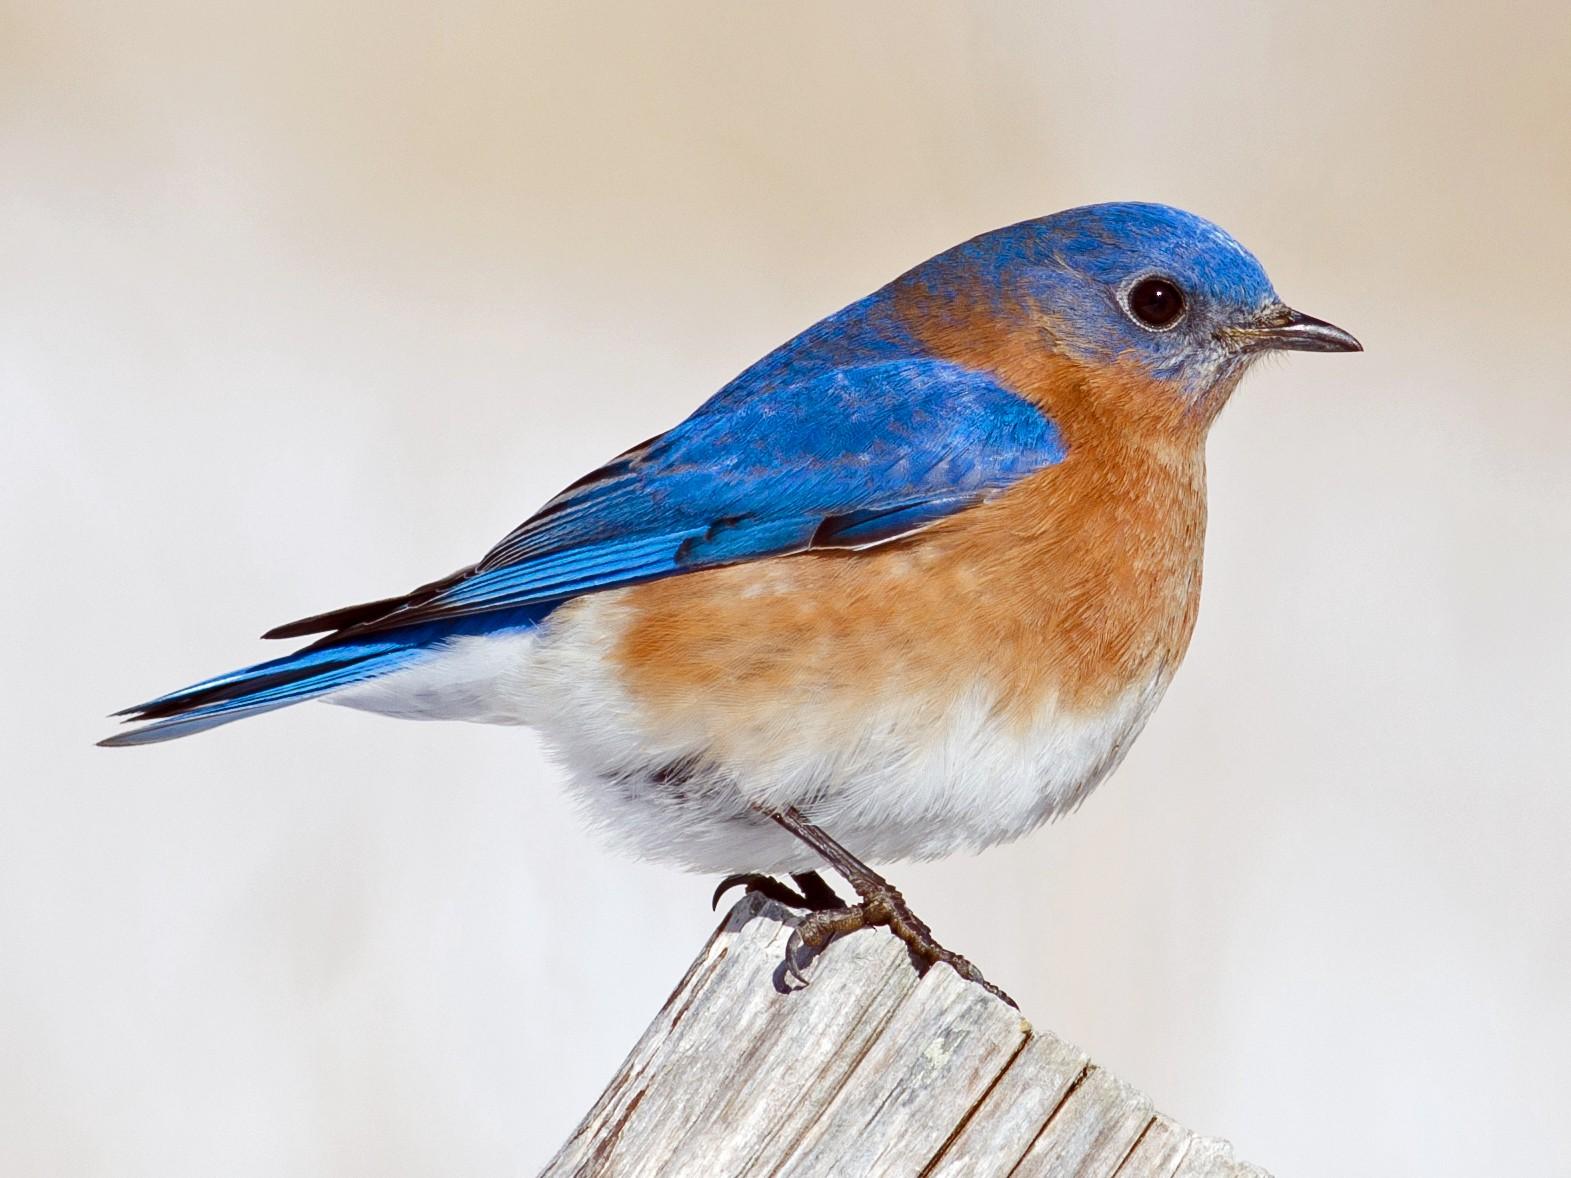 Eastern Bluebird - Alix d'Entremont